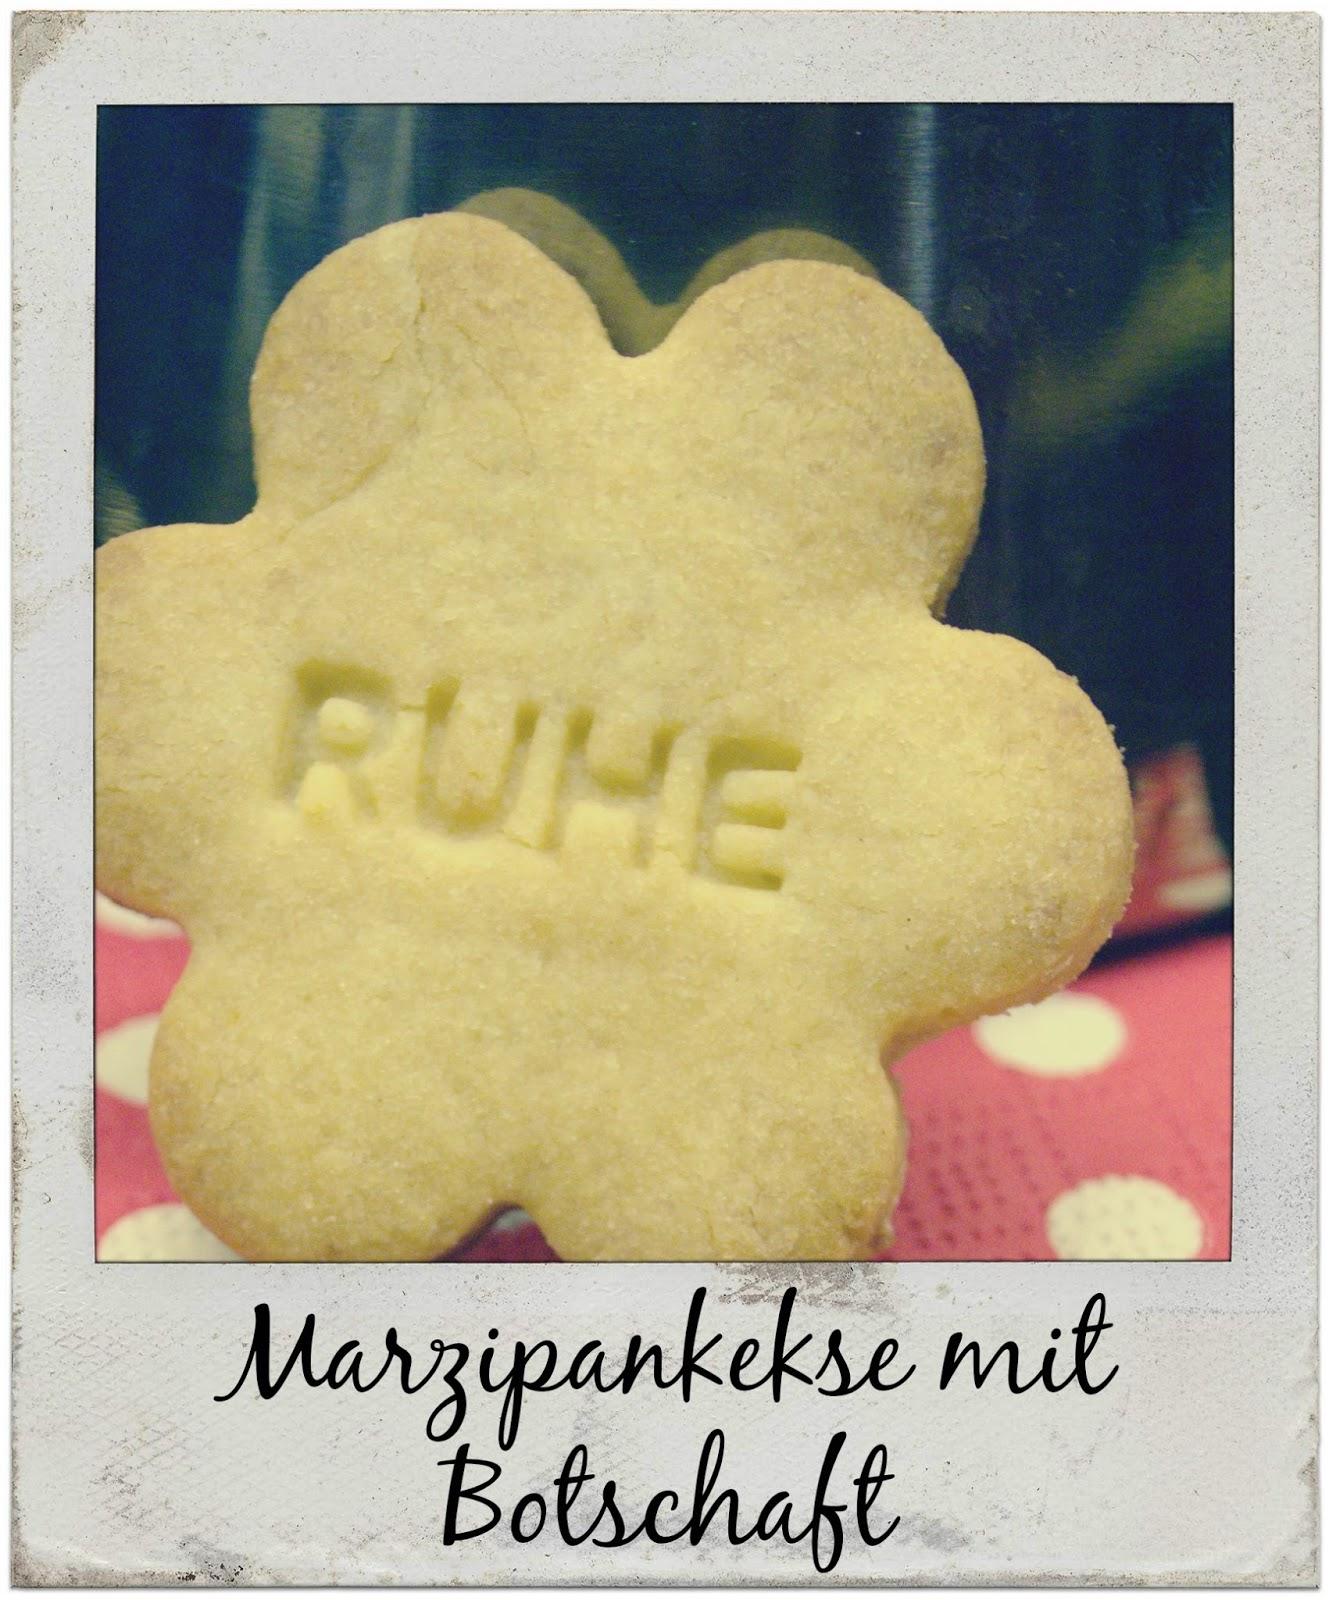 http://gemachtesundgedachtes.blogspot.de/2013/02/kleine-geschenke-fur-liebe-freunde.html